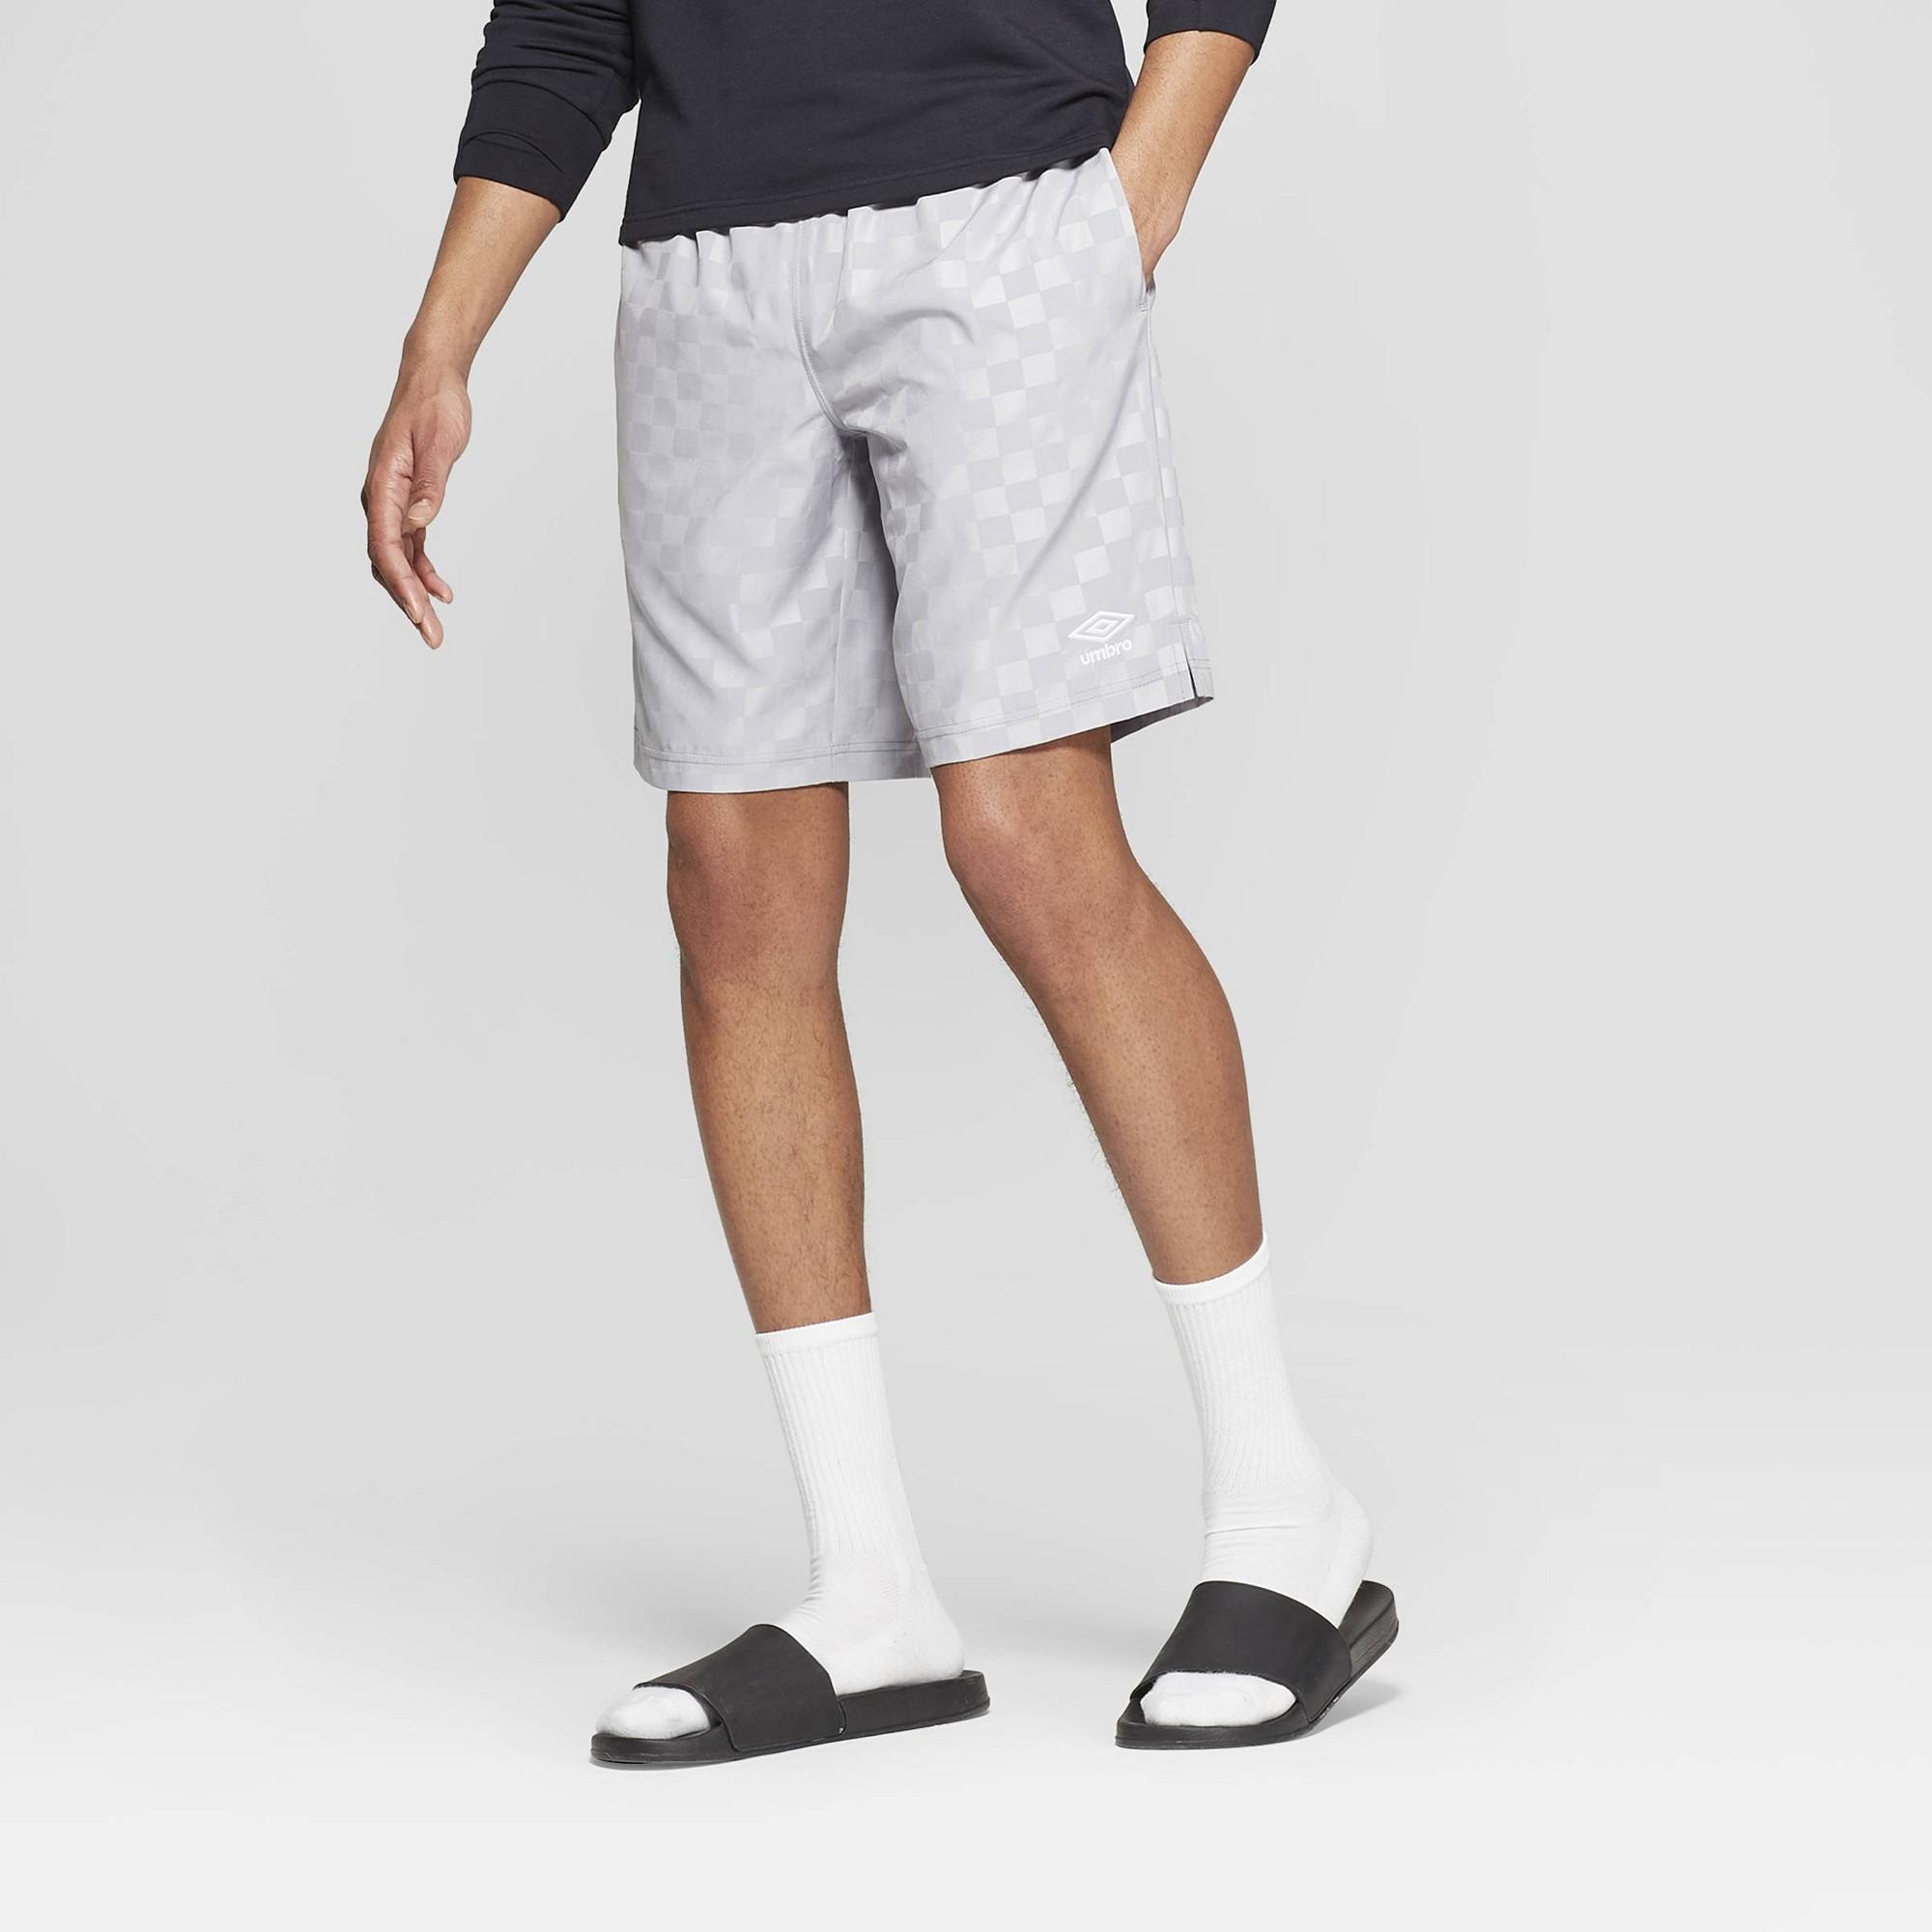 umbro checkerboard shorts